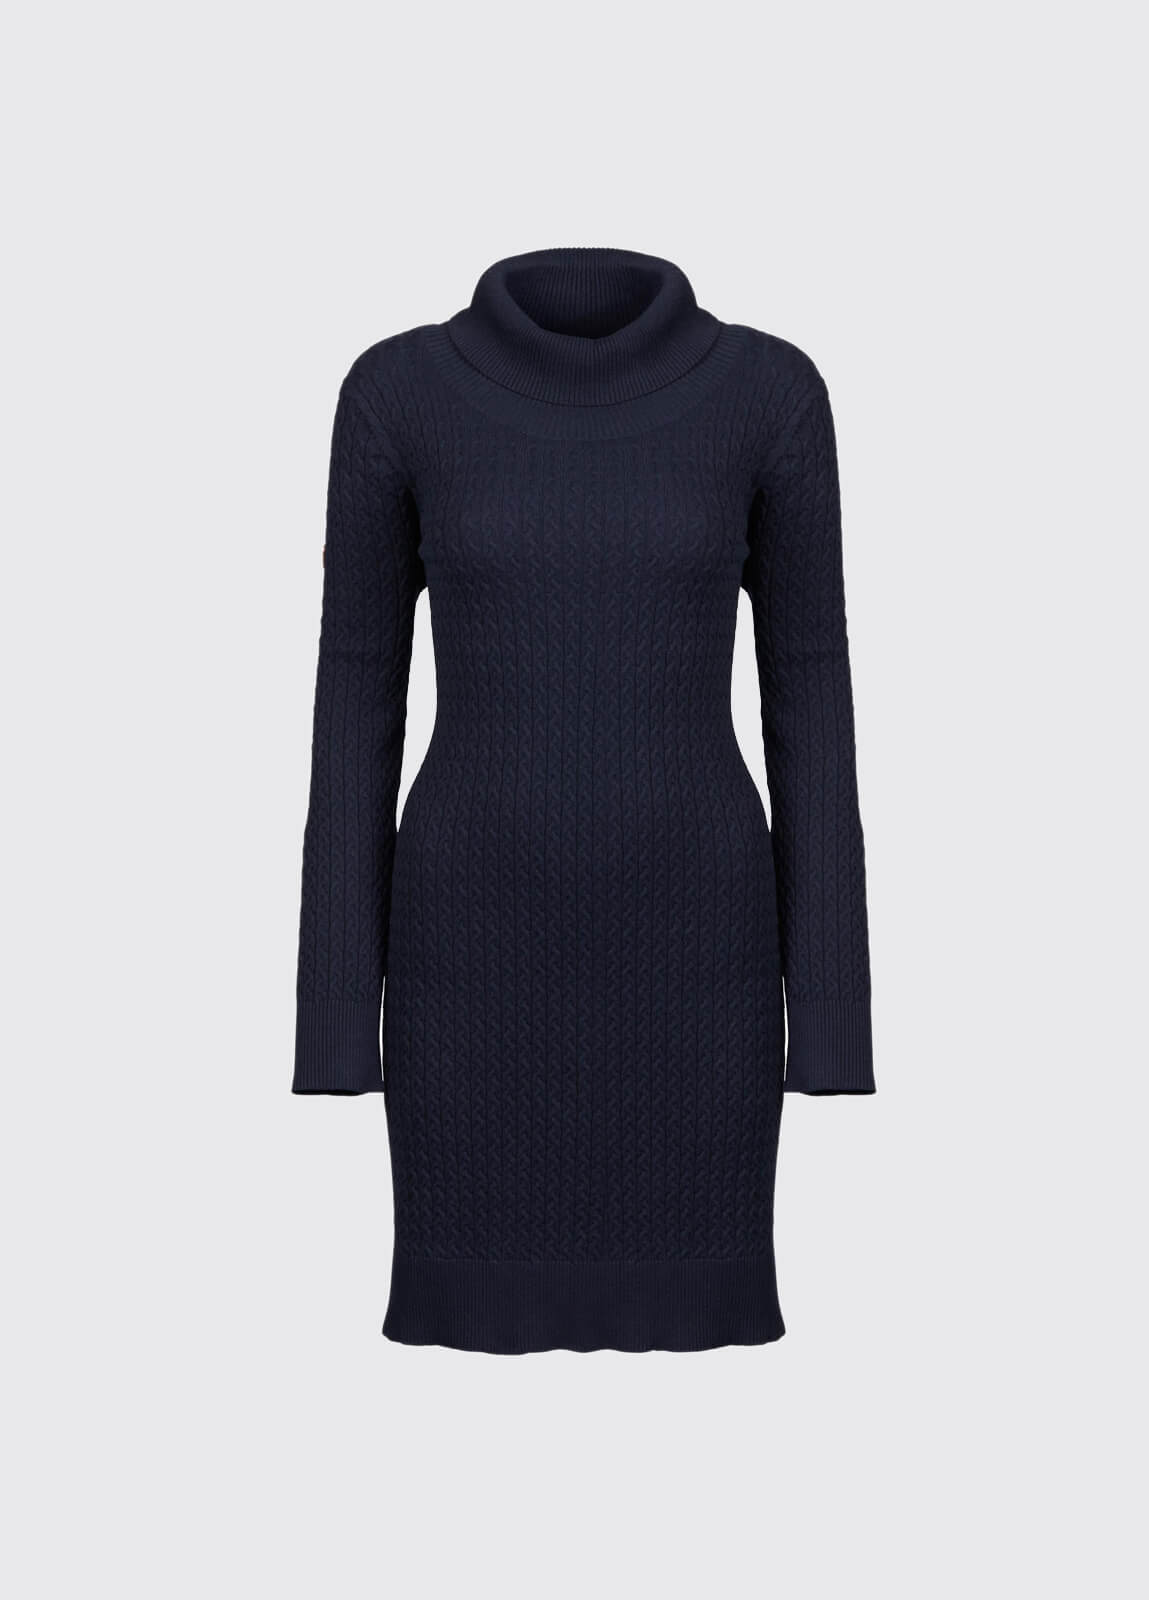 Renvyle Sweater Dress - Navy